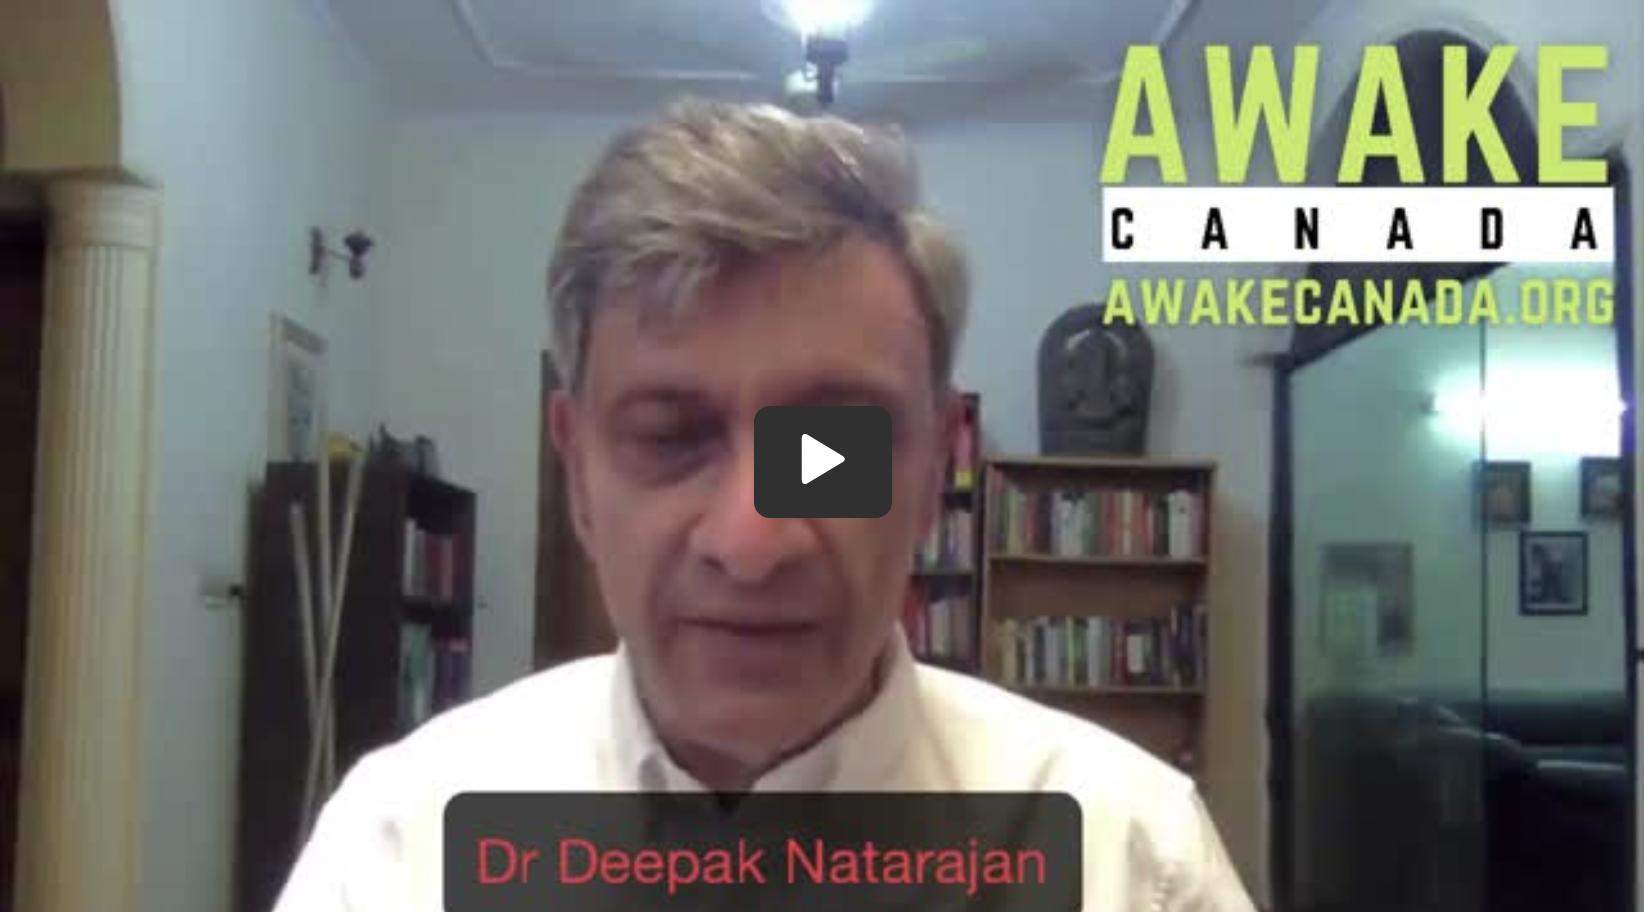 Dr Deepak Natarajan has proven Ivermectin works.